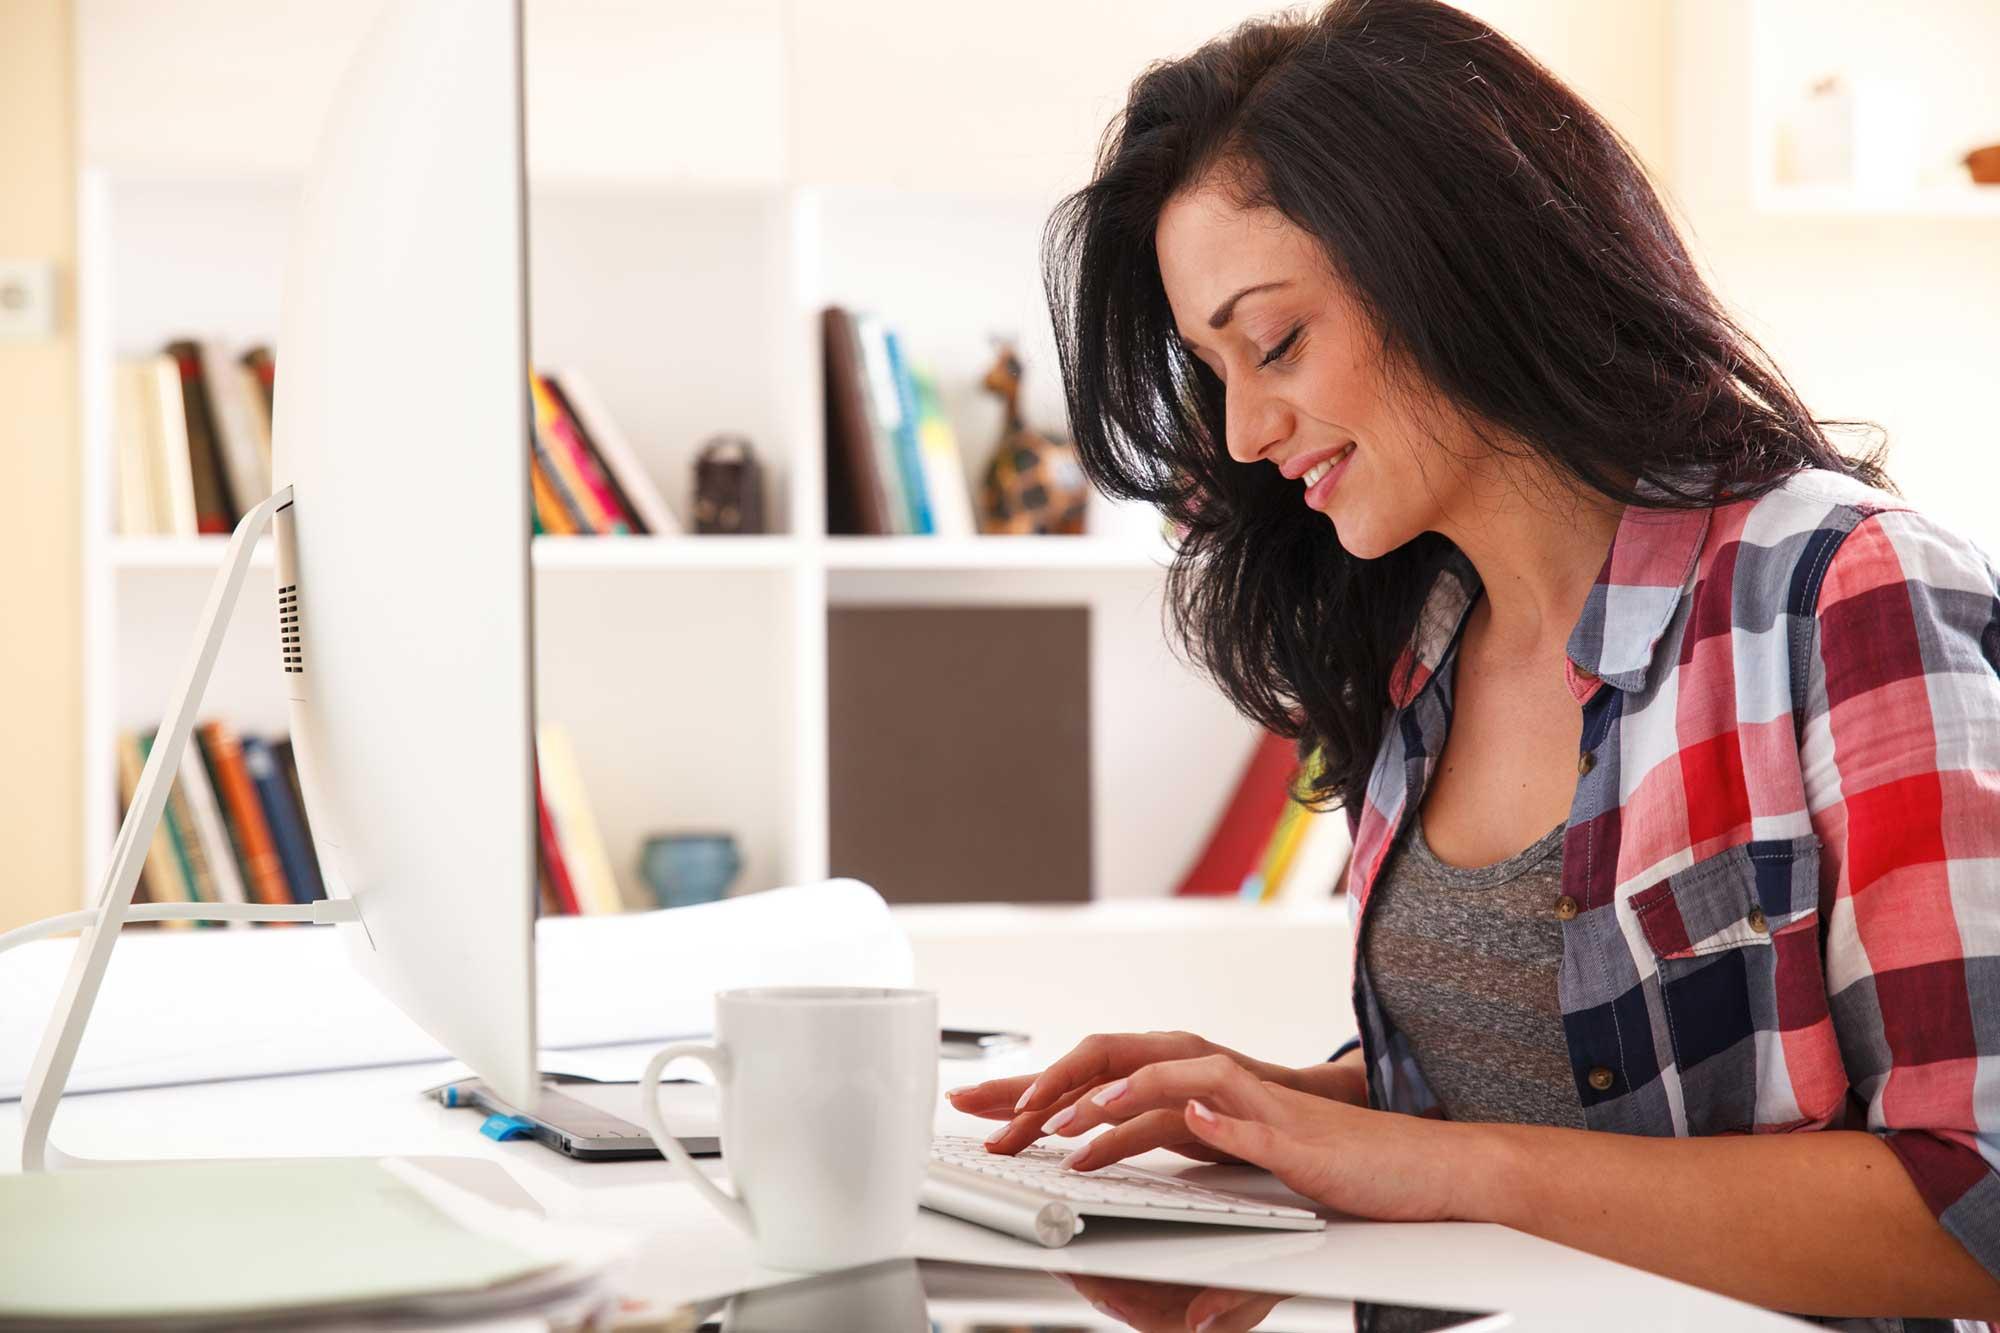 Woman-on-Computer-Blogging